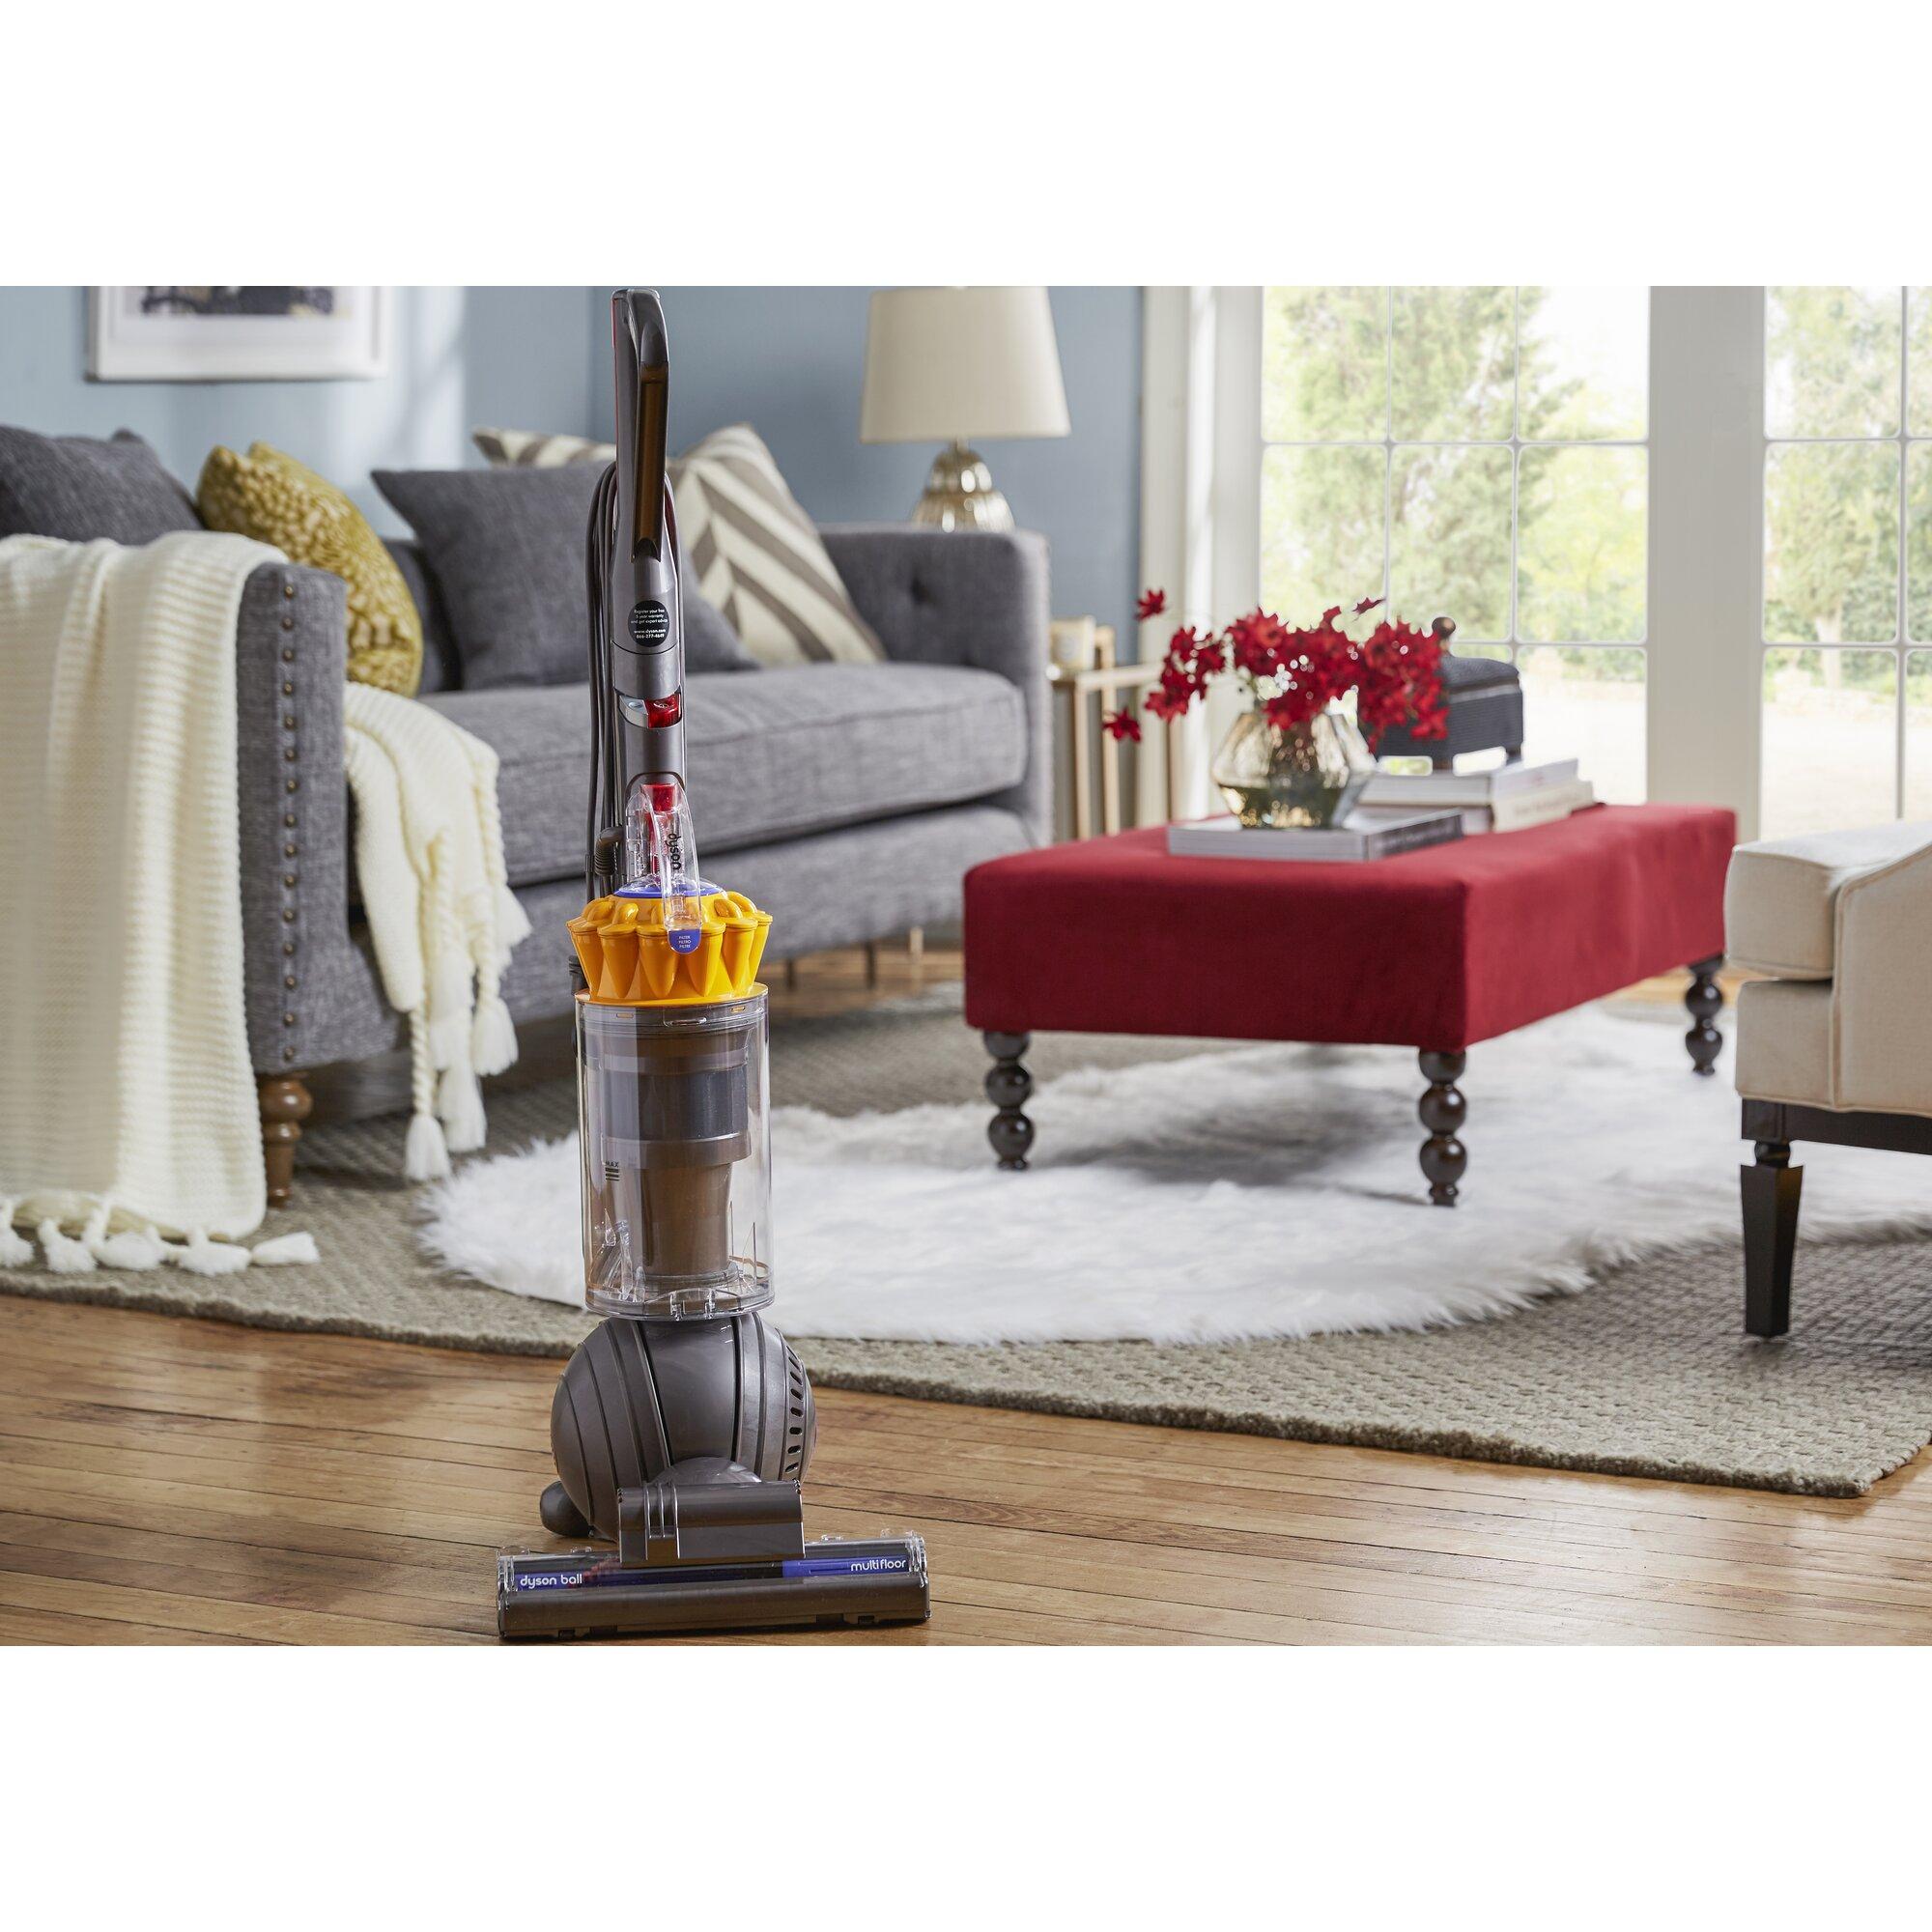 Dyson Multi Floor Dyson Dc Multi Floor Canister Vacuum Cleaner